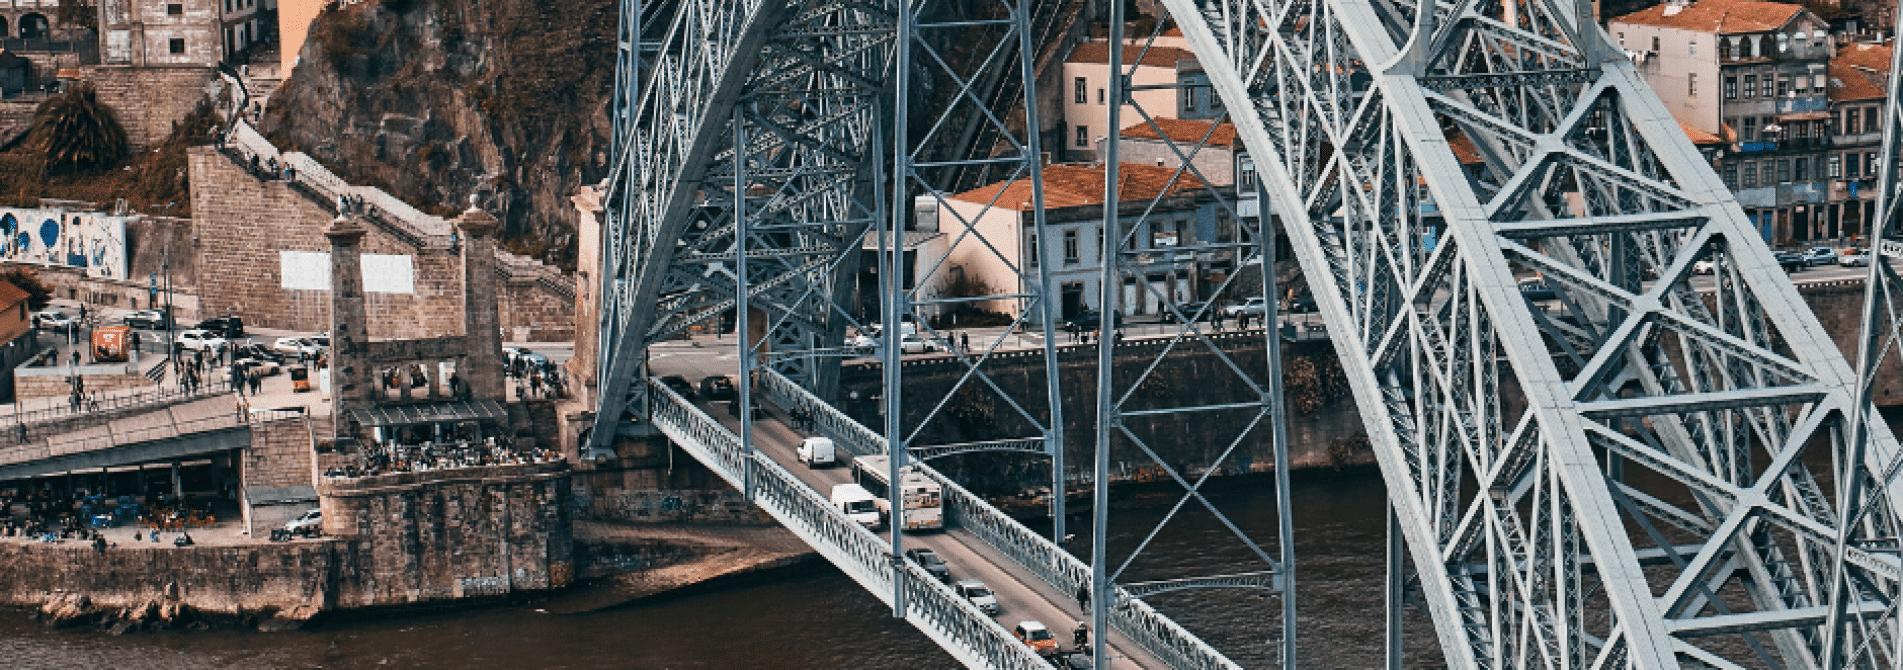 Carros na Ponte D.Luís